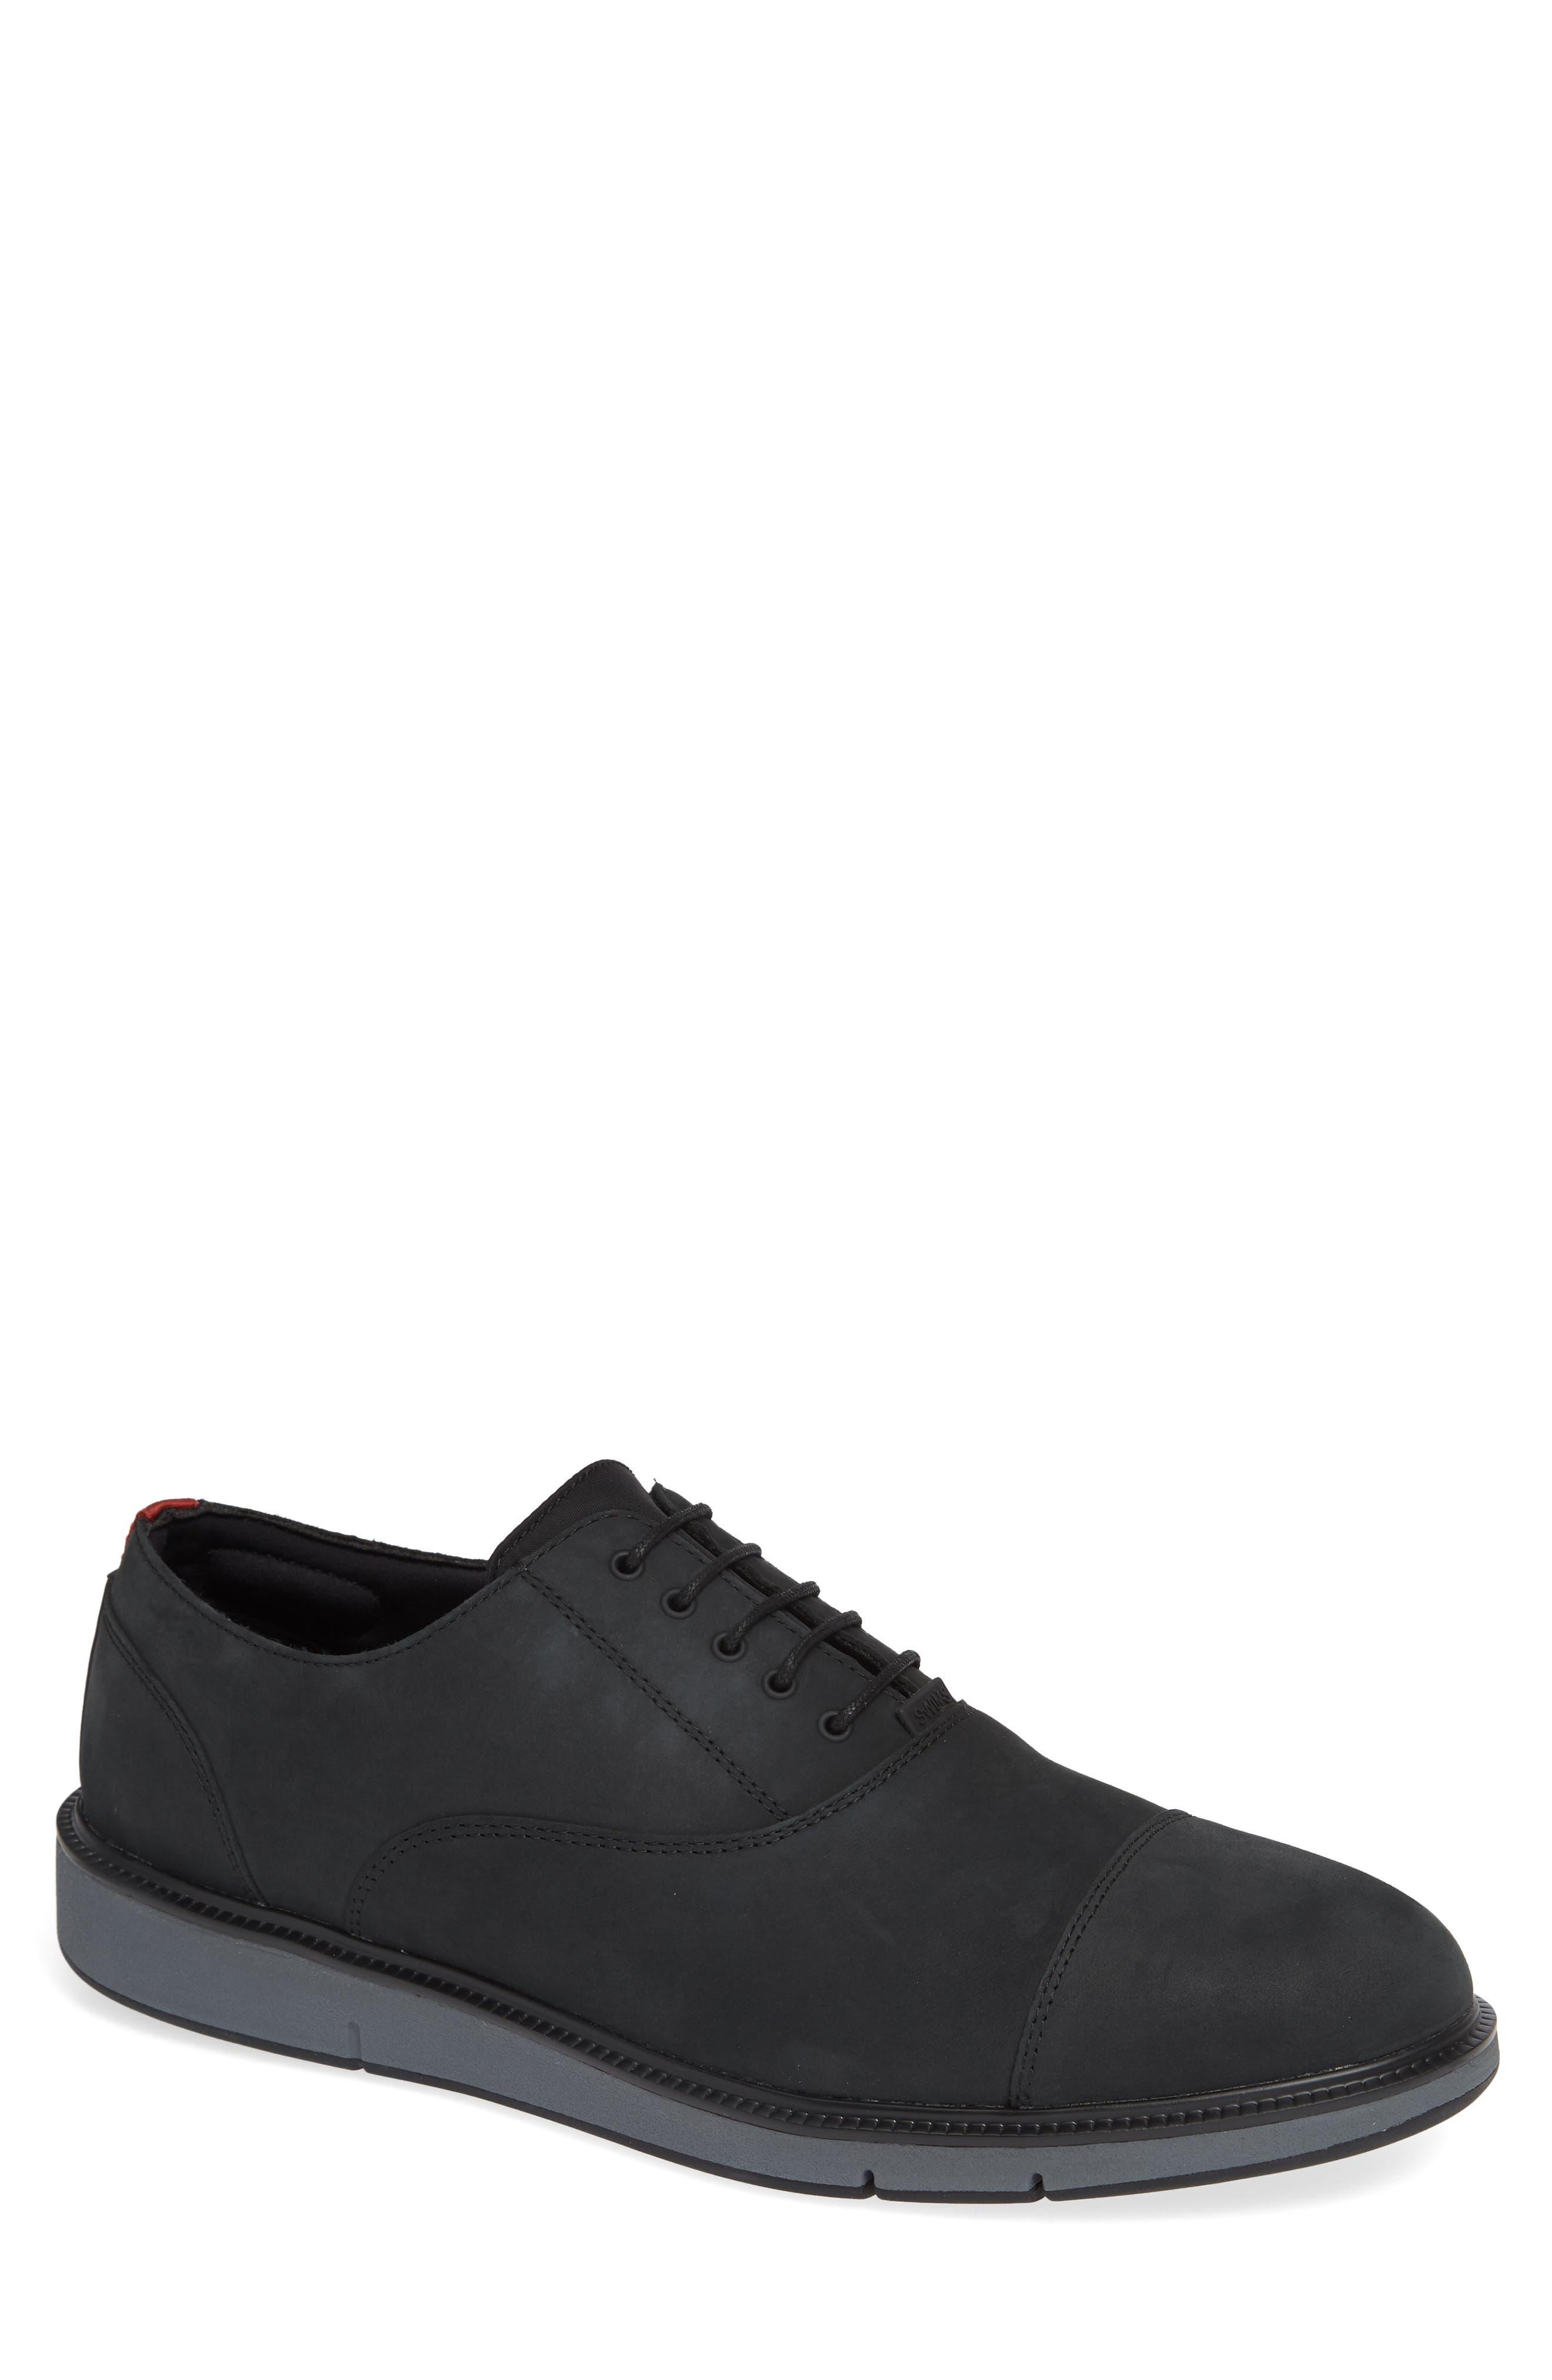 Motion Cap Toe Oxford,                         Main,                         color, BLACK/ GRAPHITE